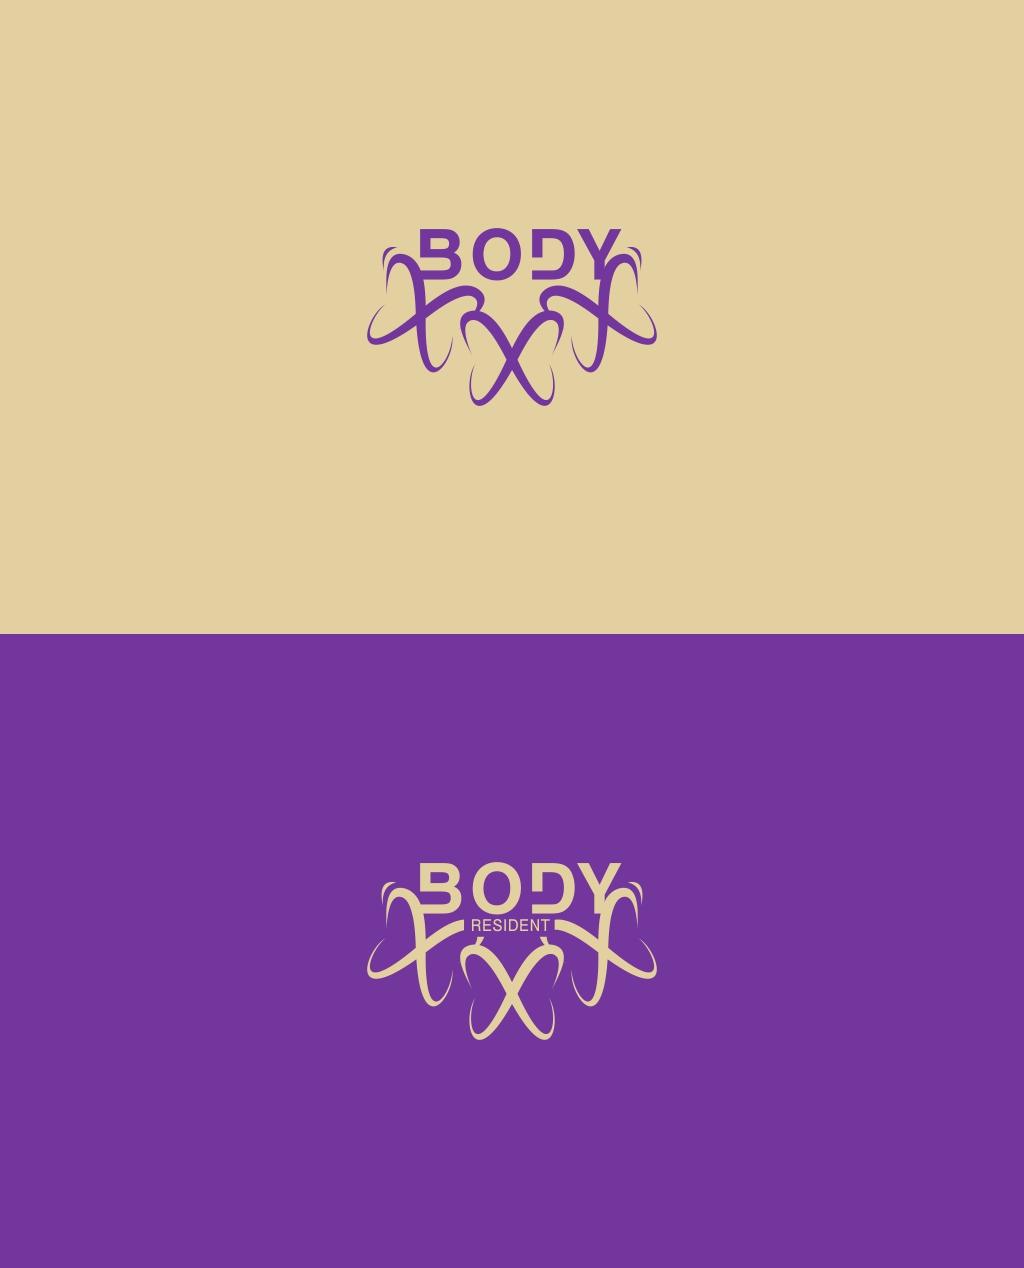 Разработка логотипа (видеоблог для моделей) фото f_9365b1e82aded4af.jpg